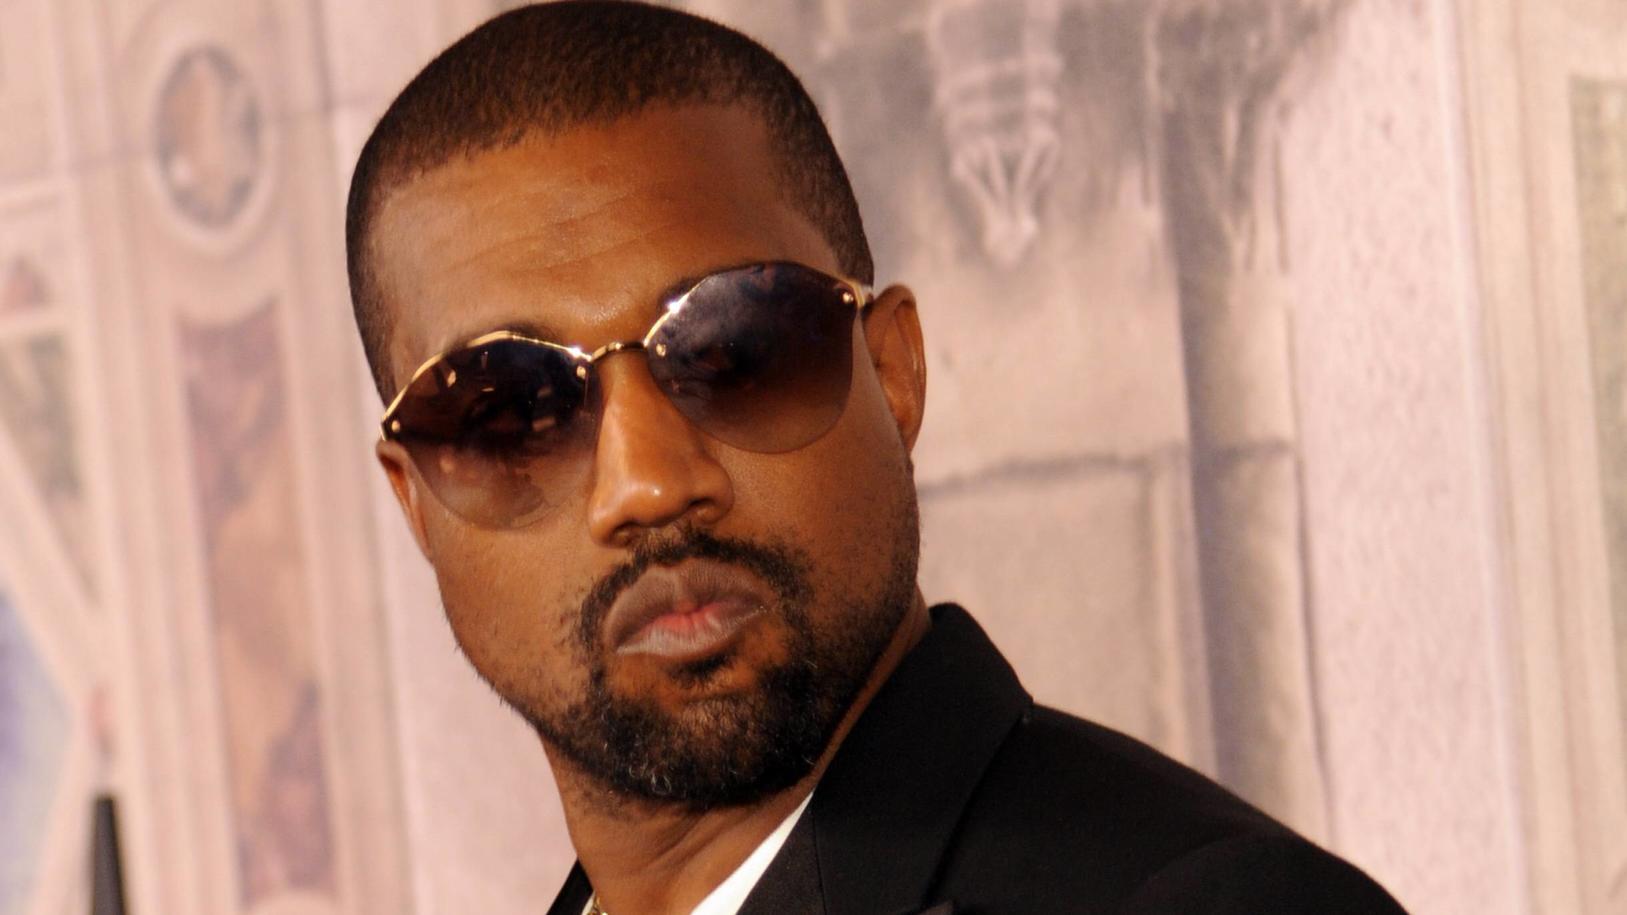 Namensänderung: US-Rapper Kanye West heißt jetzt Ye | Boulevard